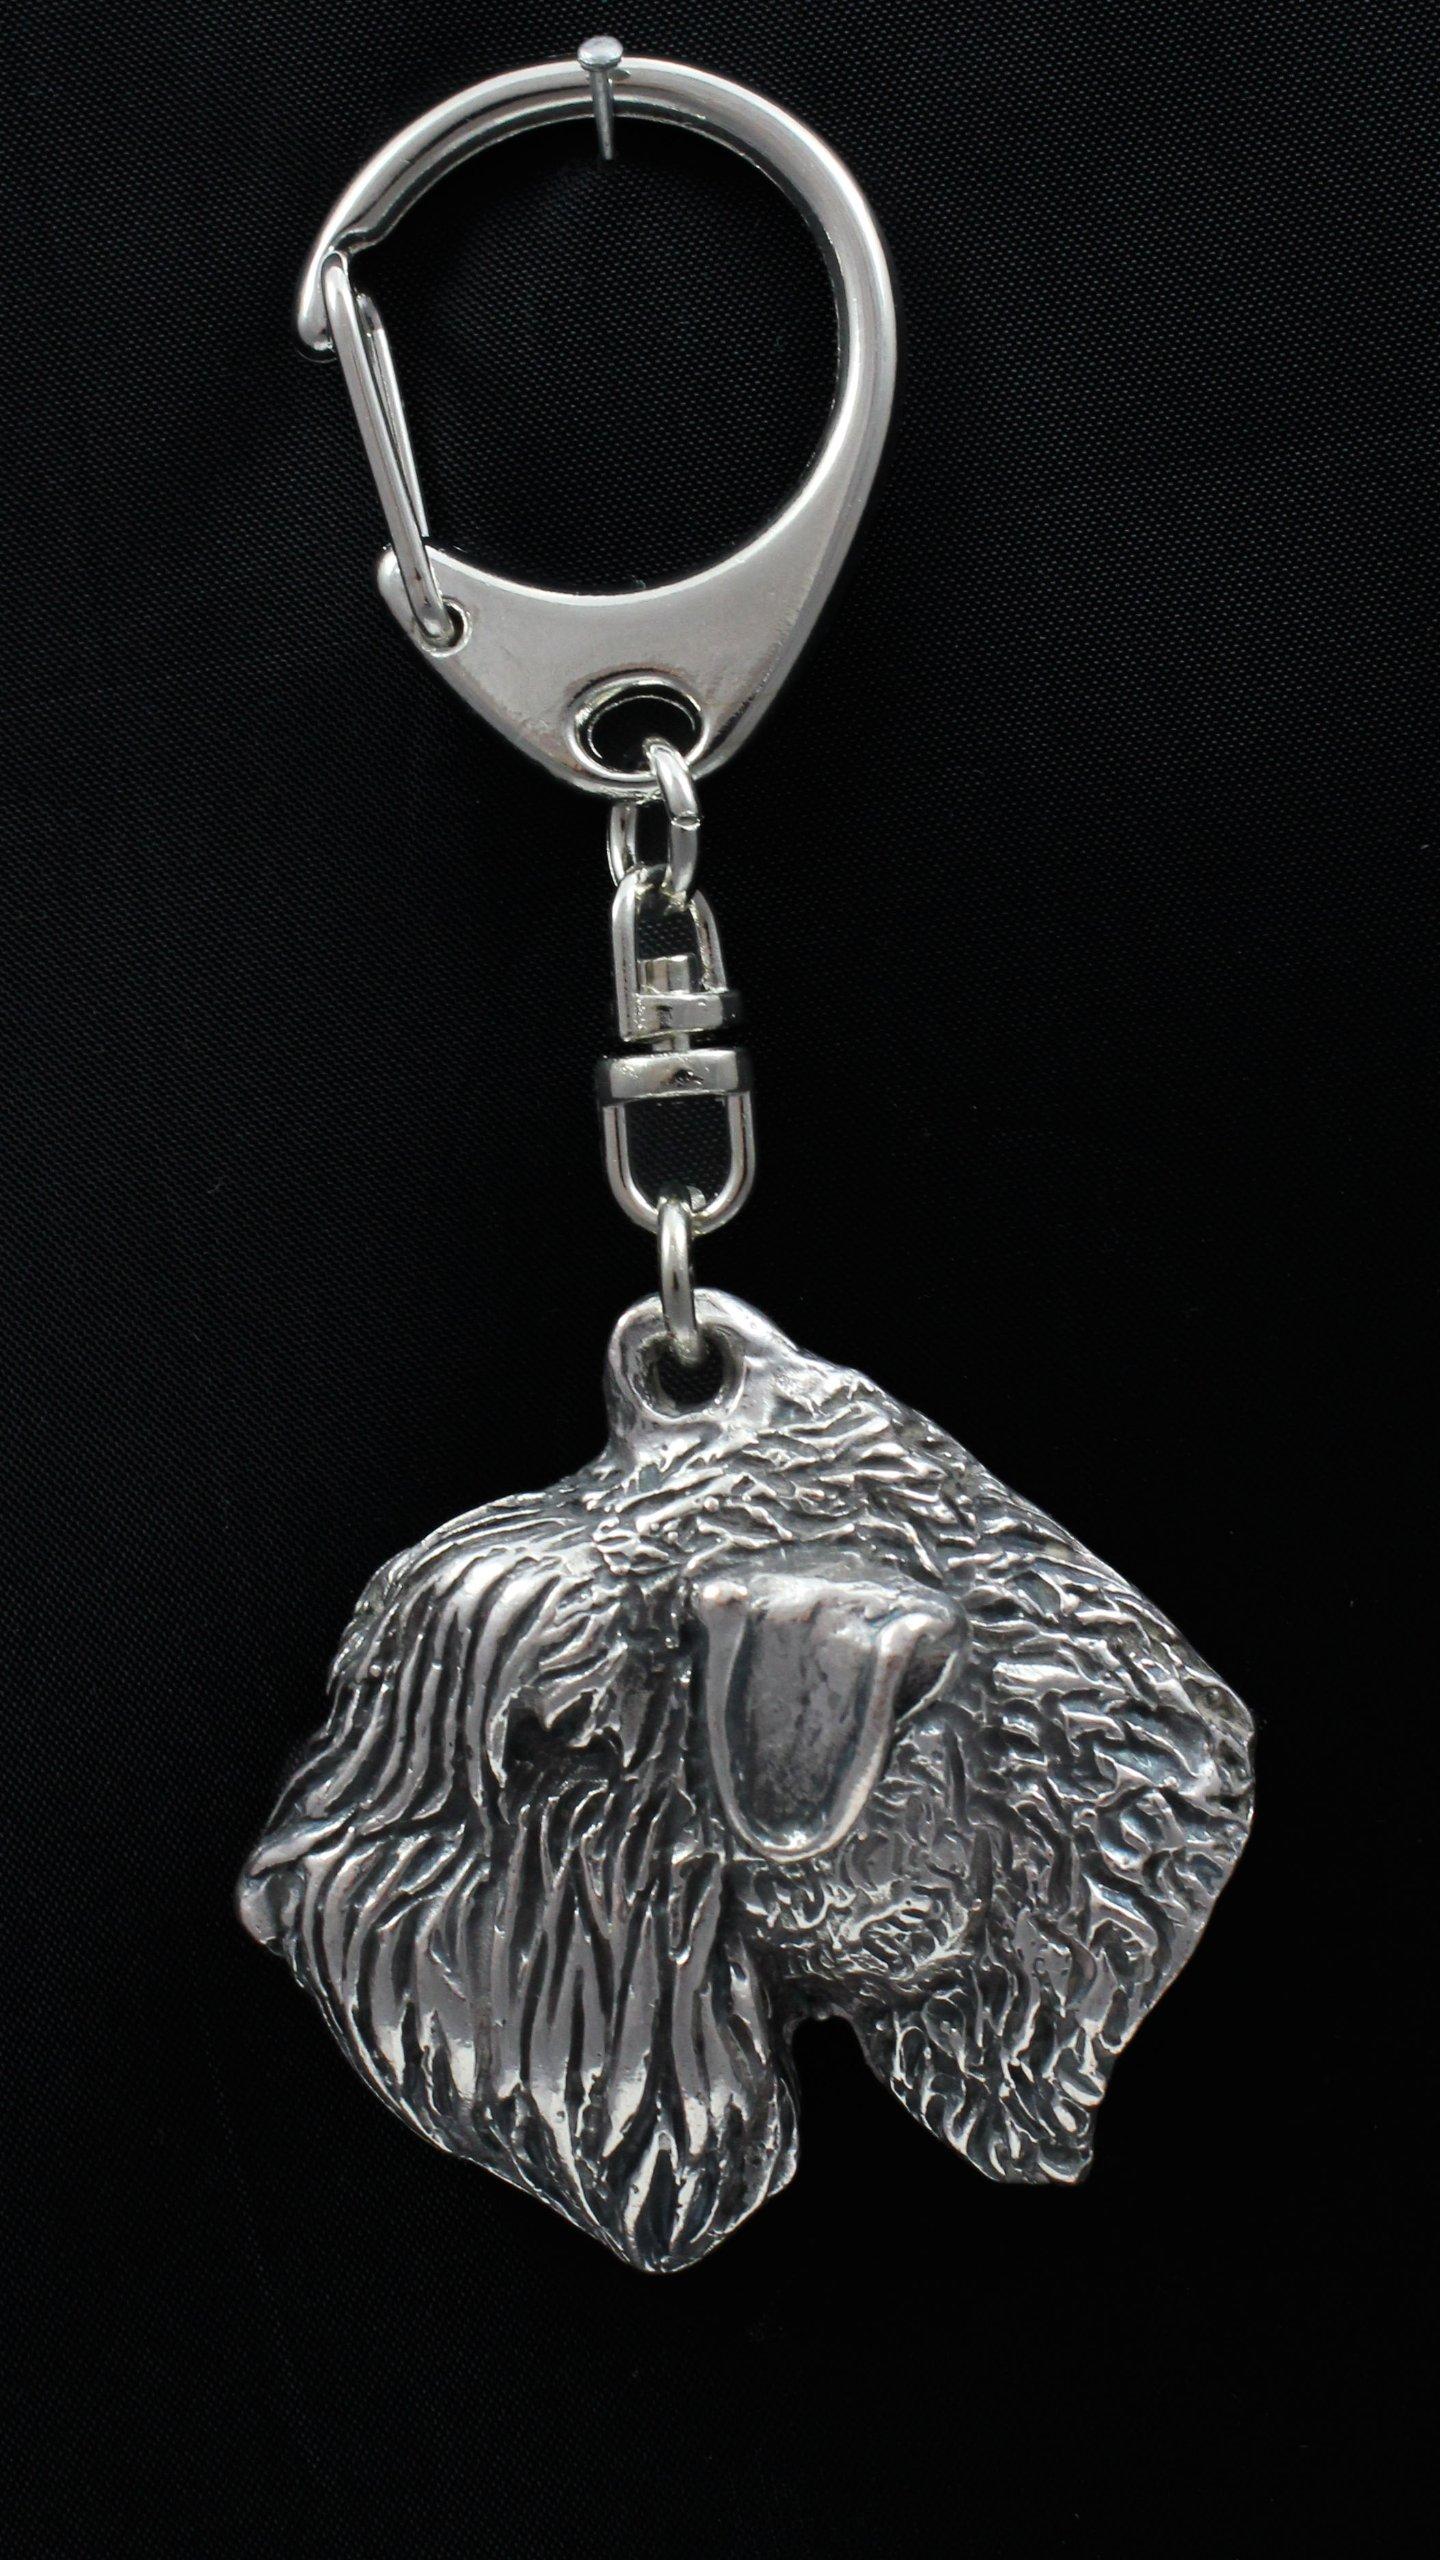 Soft-coated Wheatan Terrier, Silver Hallmark 925, Silver Dog Keyring, Keychain, Limited Edition, Artdog